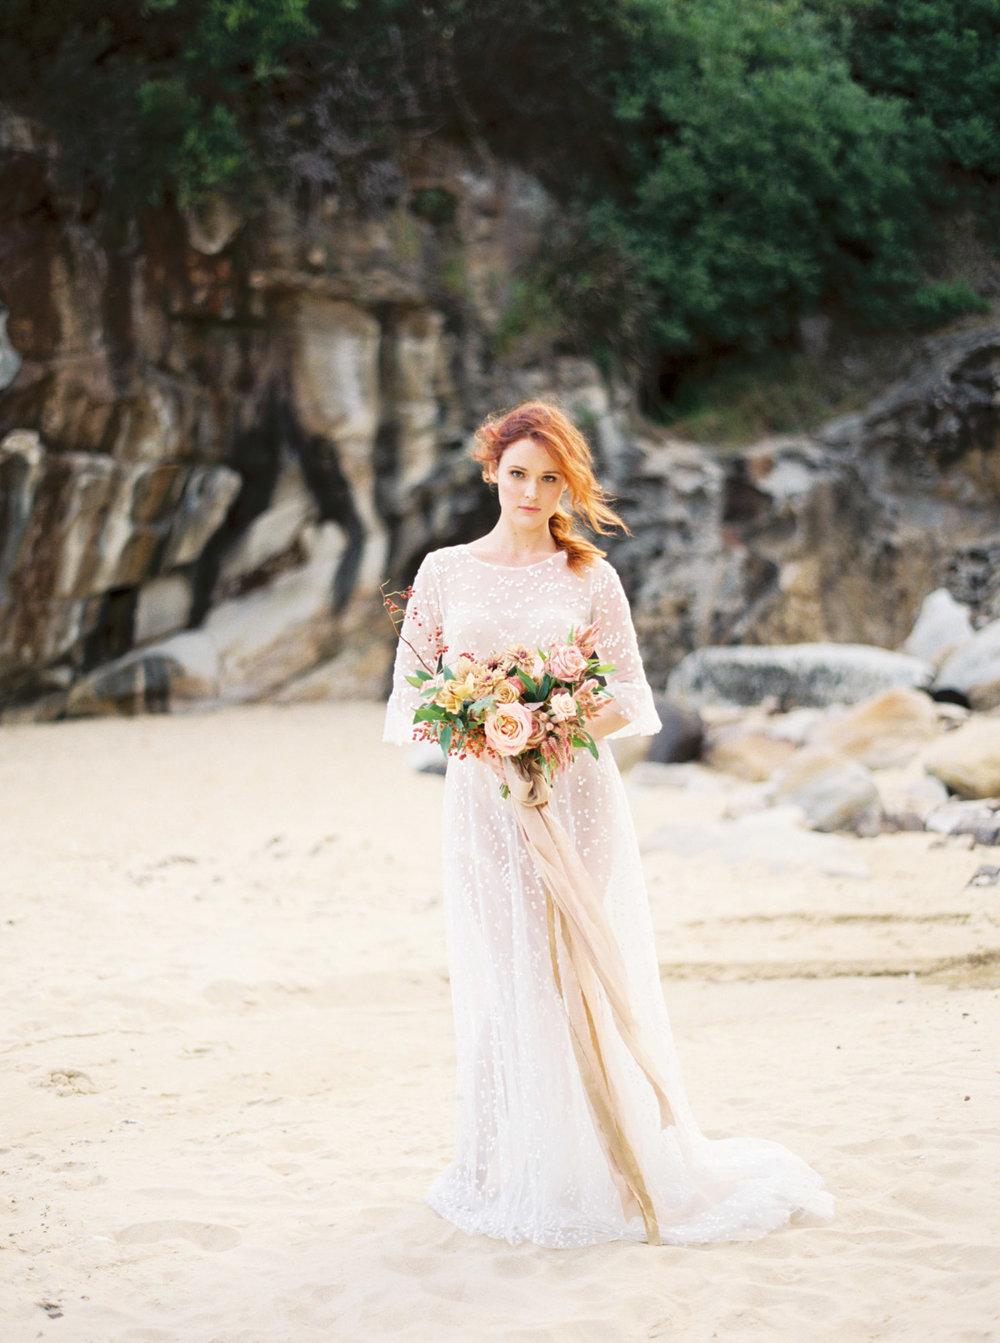 00027- Fine Art Film Central Coast NSW Australia Wedding Photographer Sheri McMahon.jpg